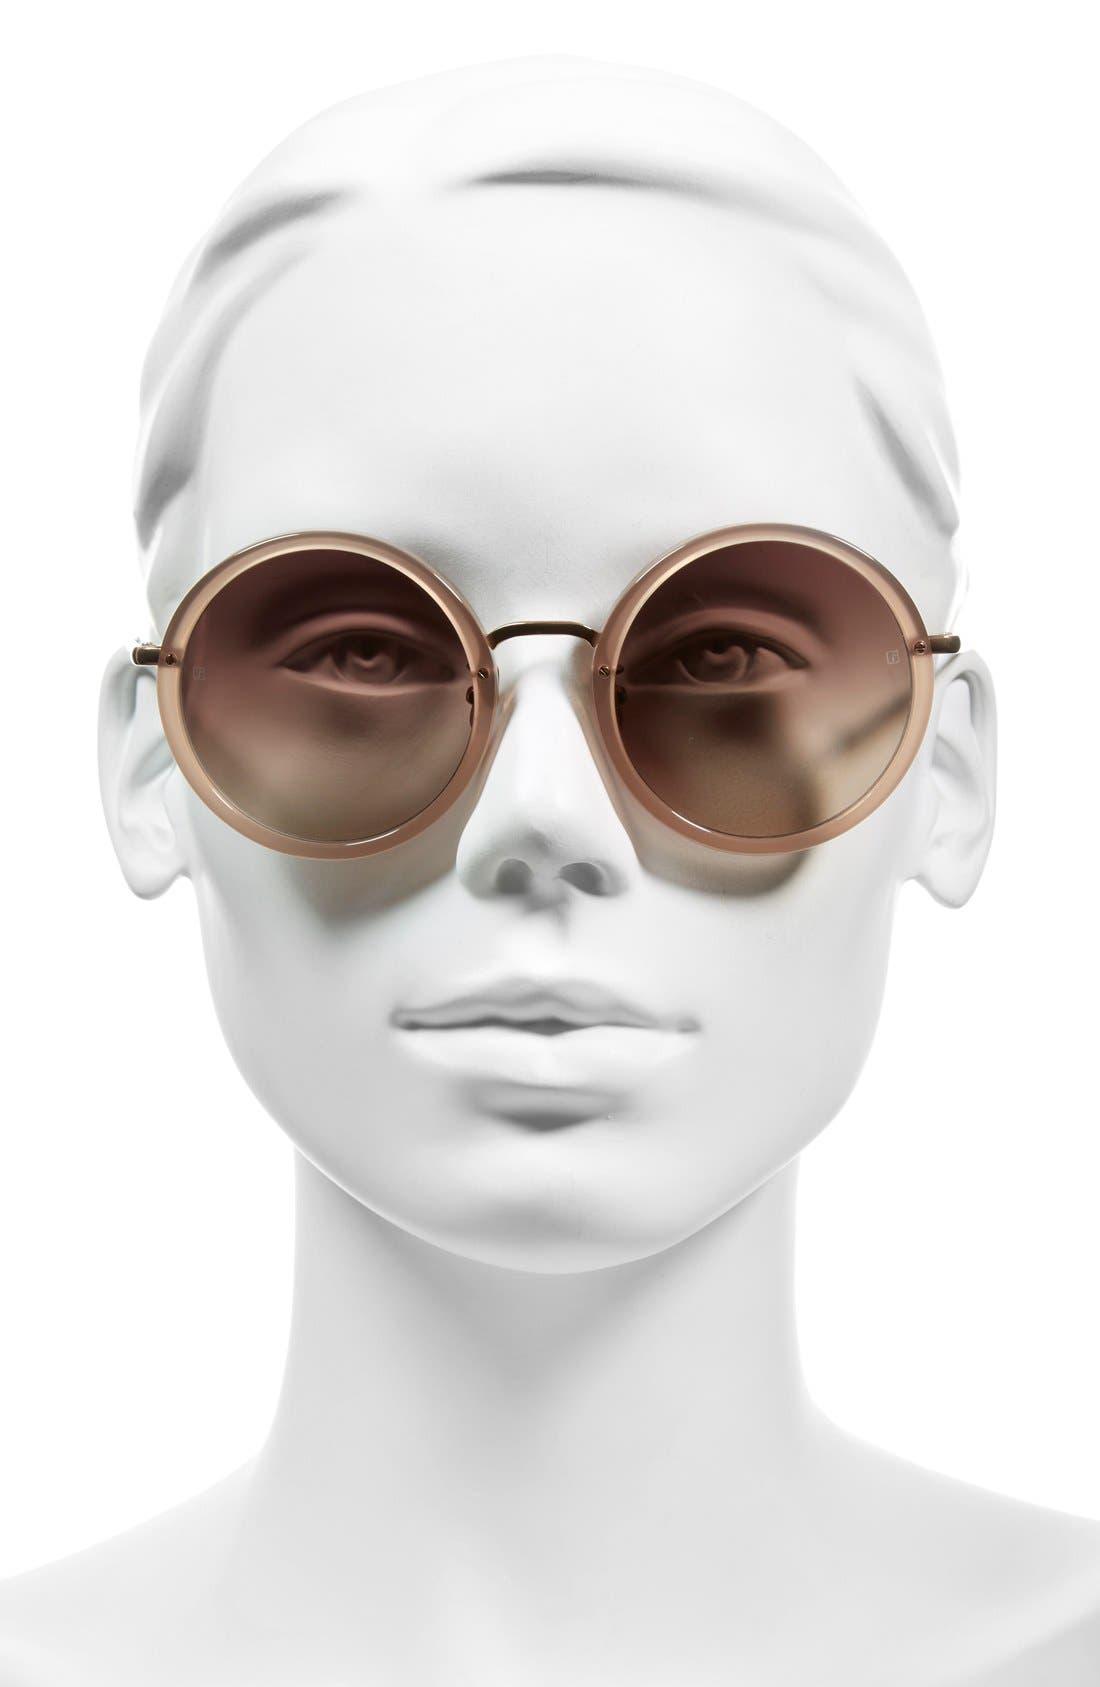 51mm Round 18 Karat Rose Gold Sunglasses,                             Alternate thumbnail 4, color,